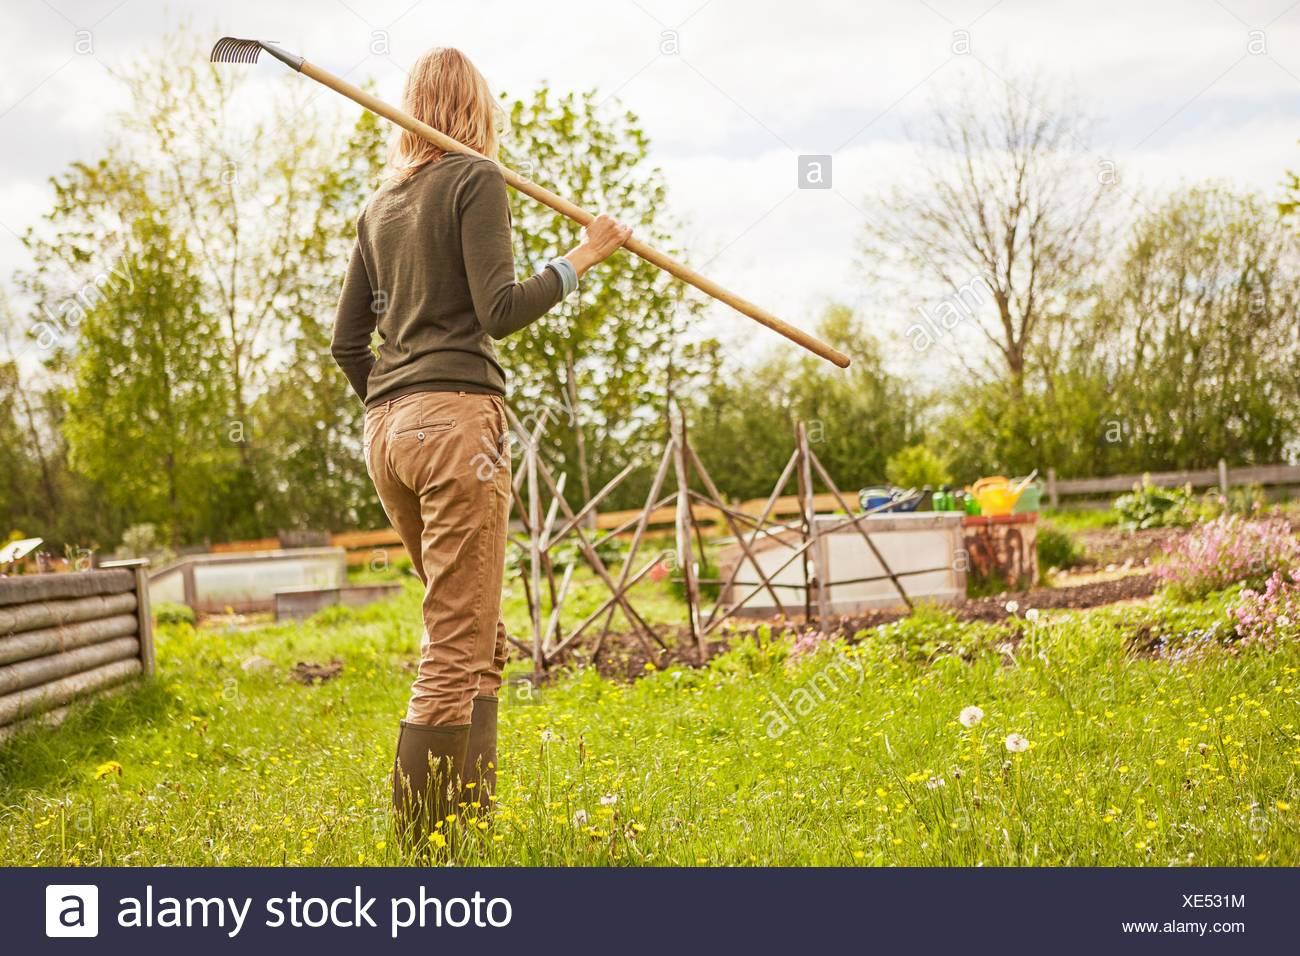 Mature woman, outdoors, gardening, carrying rake, rear view - Stock Image